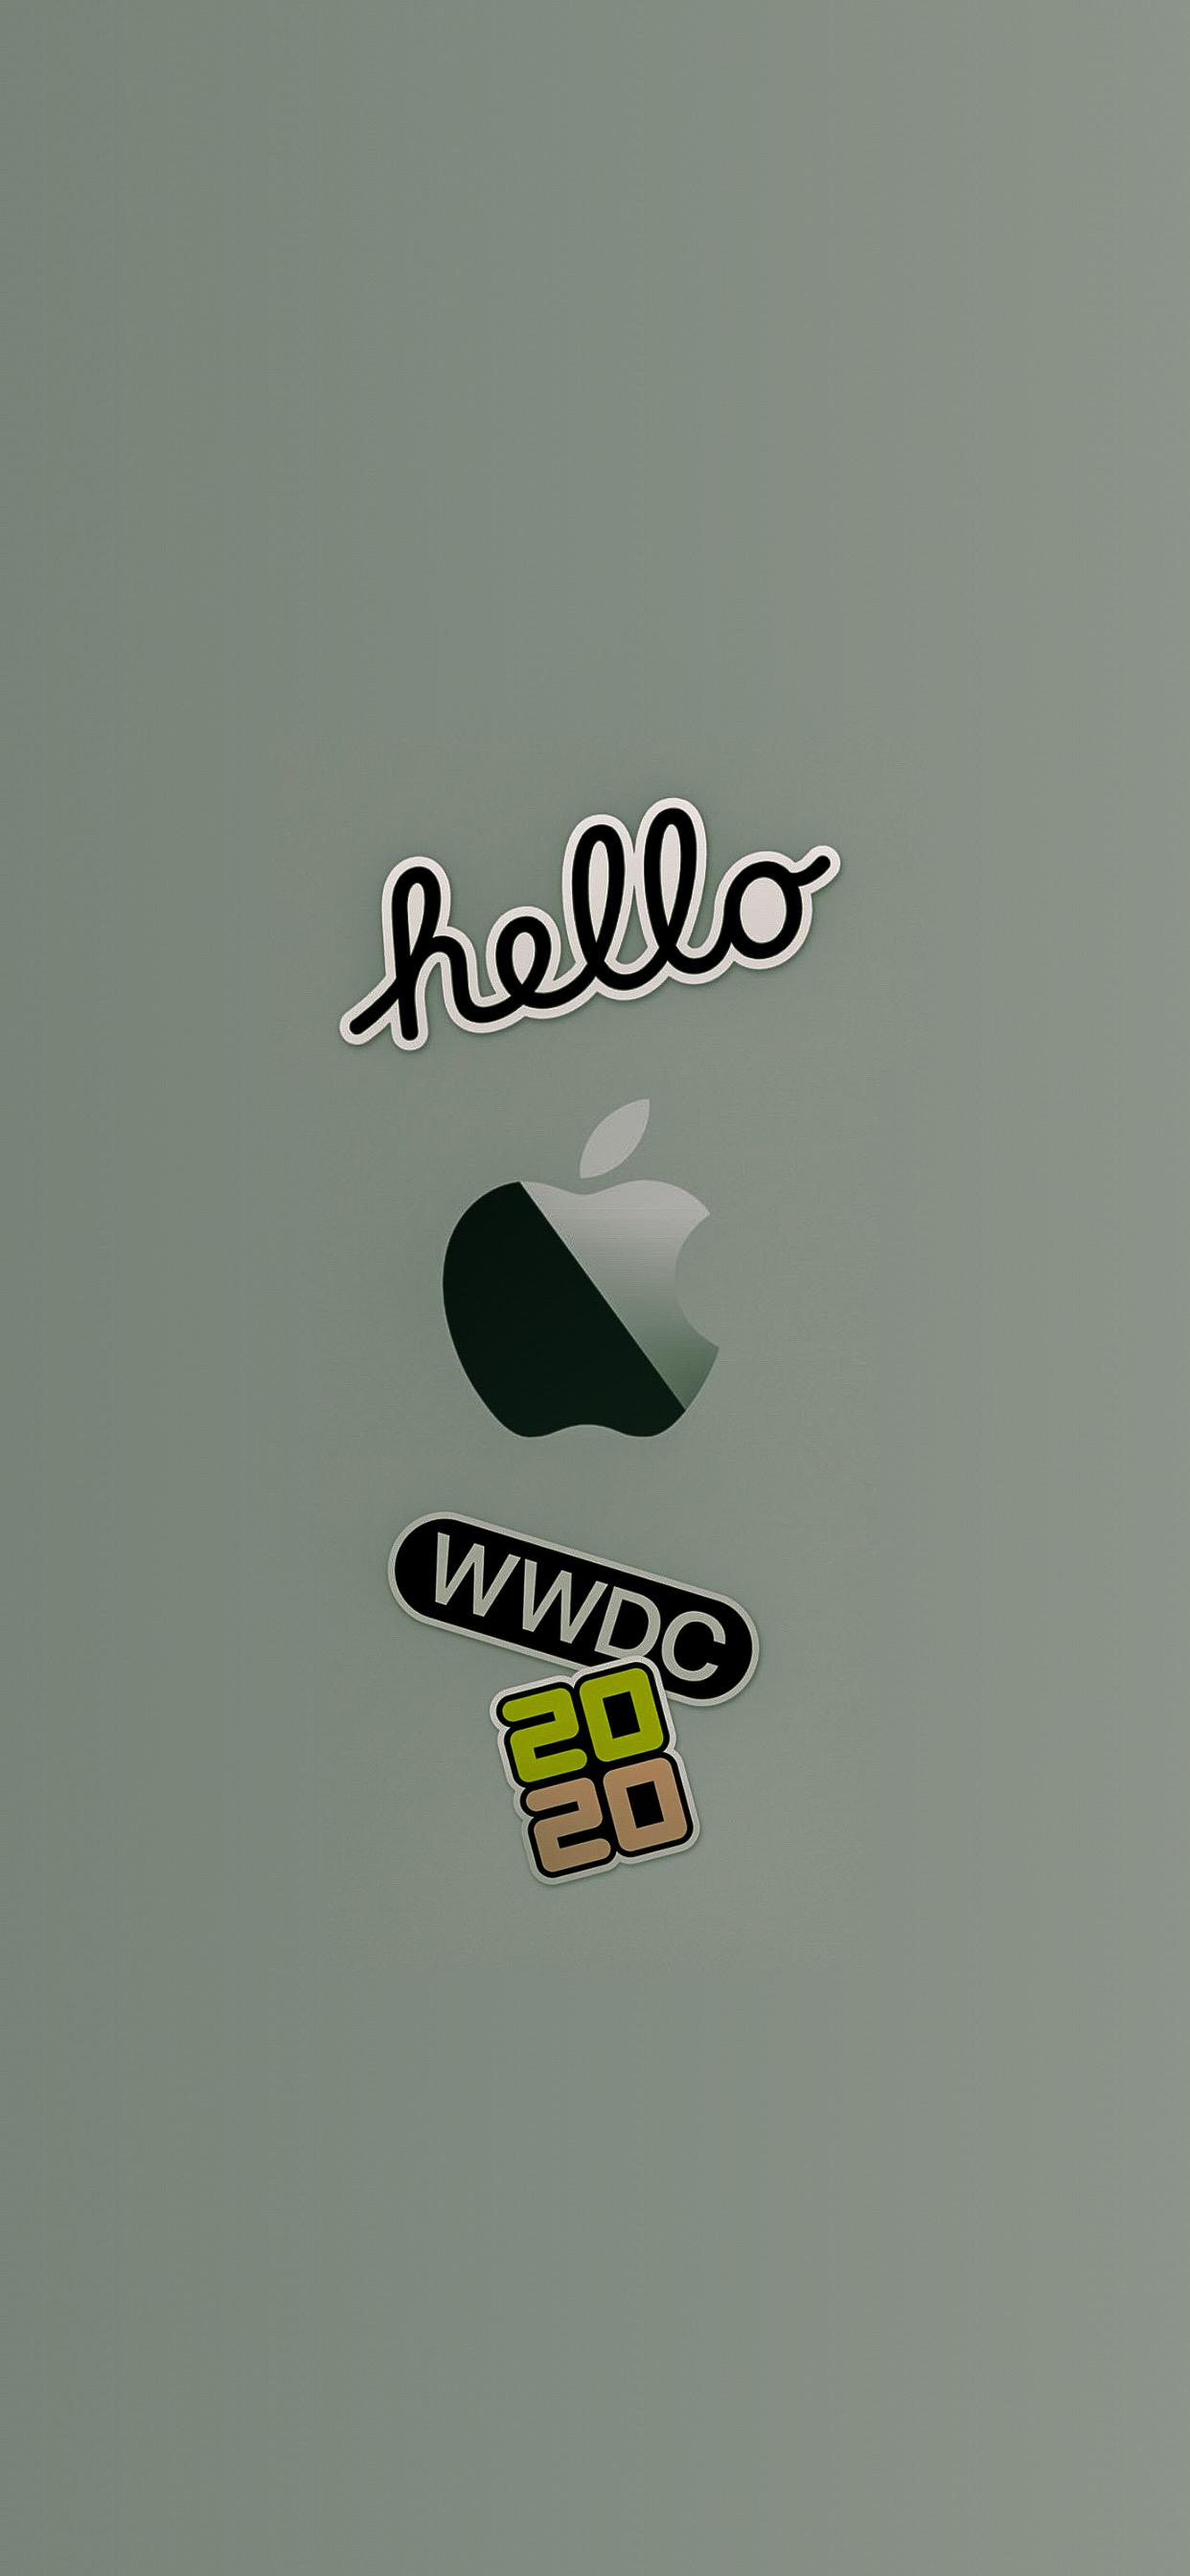 wwdc 2020 wallpaper iphone ar72014 idownloadblog Logos midnight green